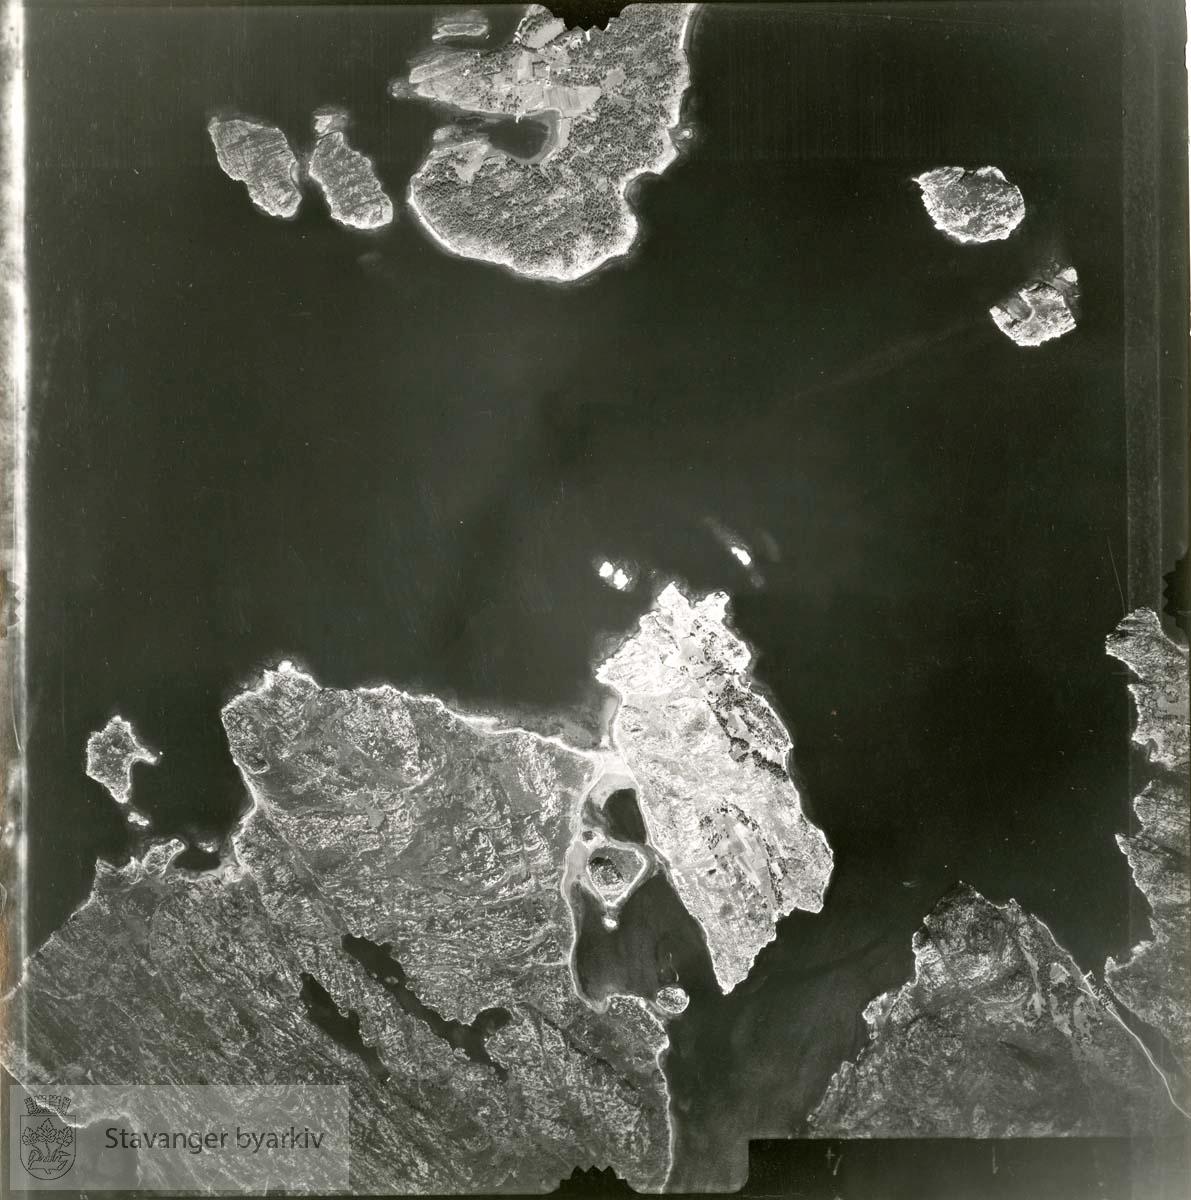 Jfr. kart/fotoplan H25/614..Usken, Bukkholmen, Tyttebærholmen, Kalvøy, Store Teistholmen, Litle Brattholmen..Se ByStW_Uca_002 (kan lastes ned under fanen for kart på Stavangerbilder)